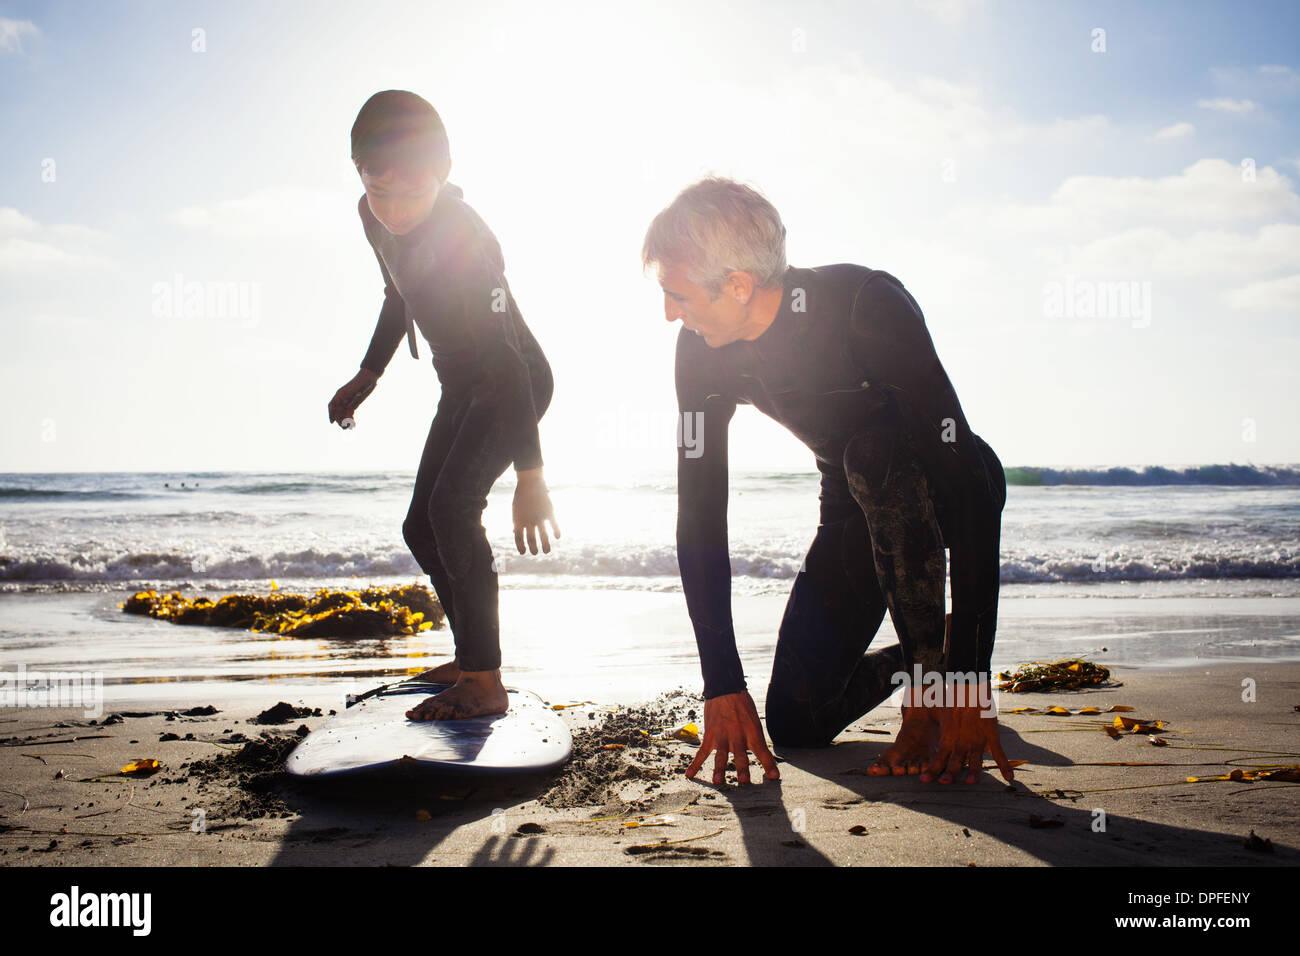 Vater und Sohn üben mit Surfbrett am Strand, Encinitas, Kalifornien, USA Stockbild